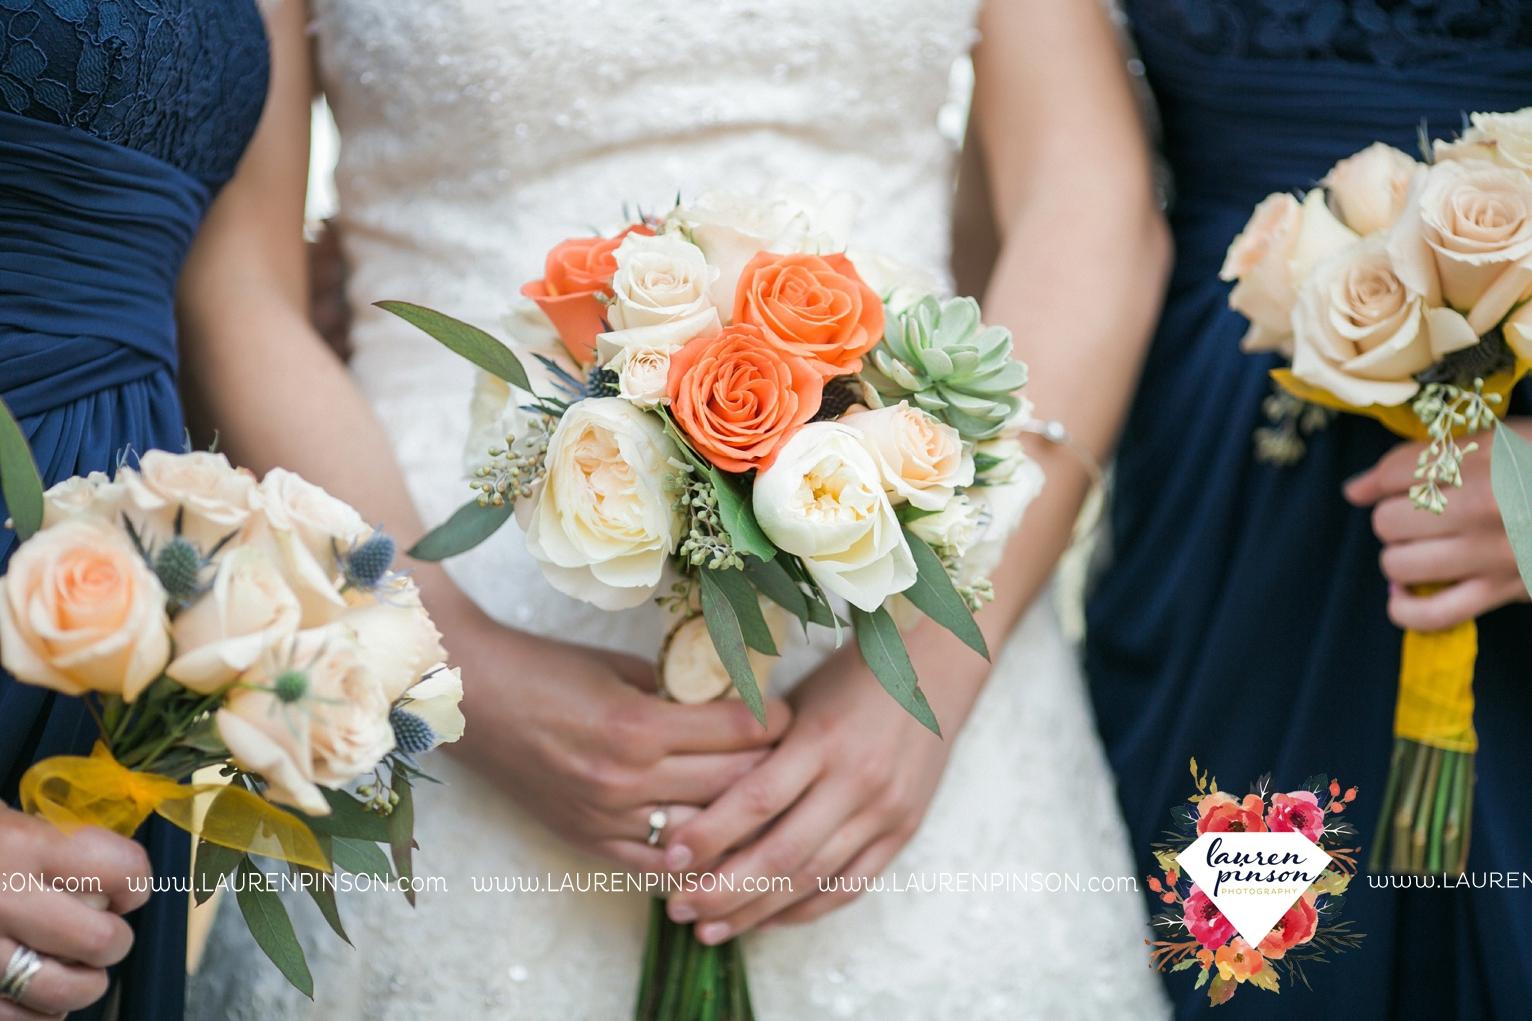 kemp-center-for-the-arts-wichita-falls-texas-wedding-photographer-fall-wedding-pumpkins-141.jpg